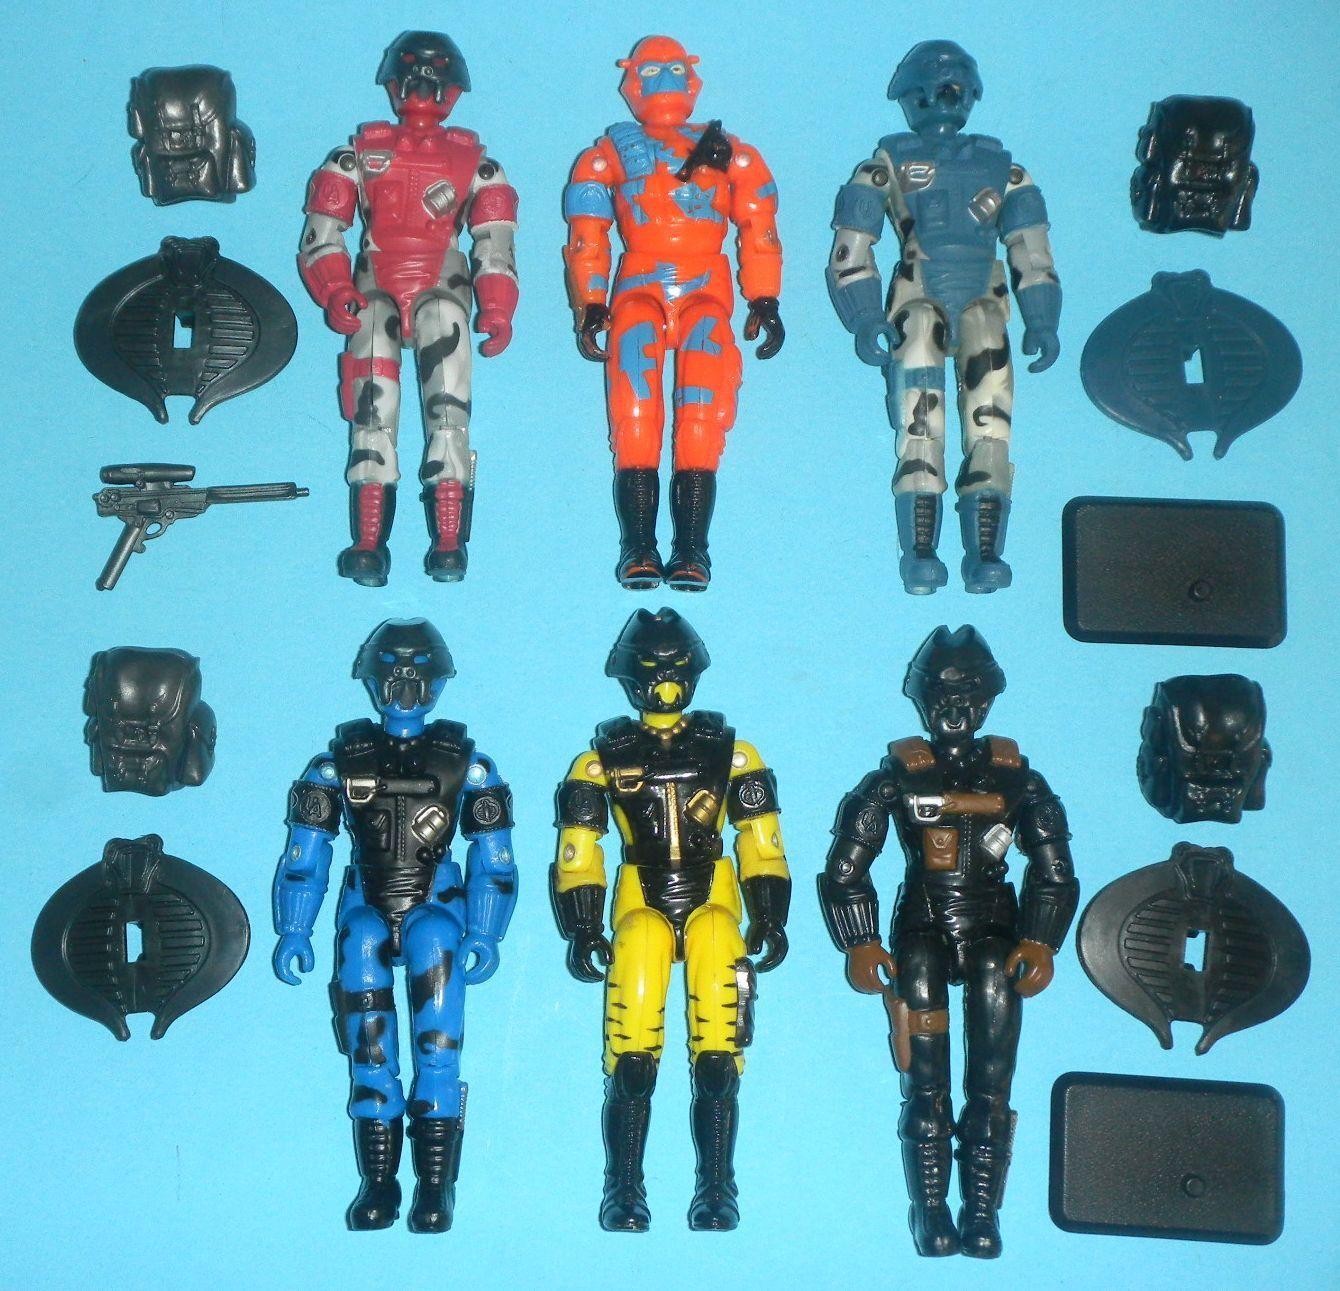 Lot x6 GI Joe Cobra Urban Assault Trooper Alley Viper Figures v1 v2 v5 v6 v7 v9